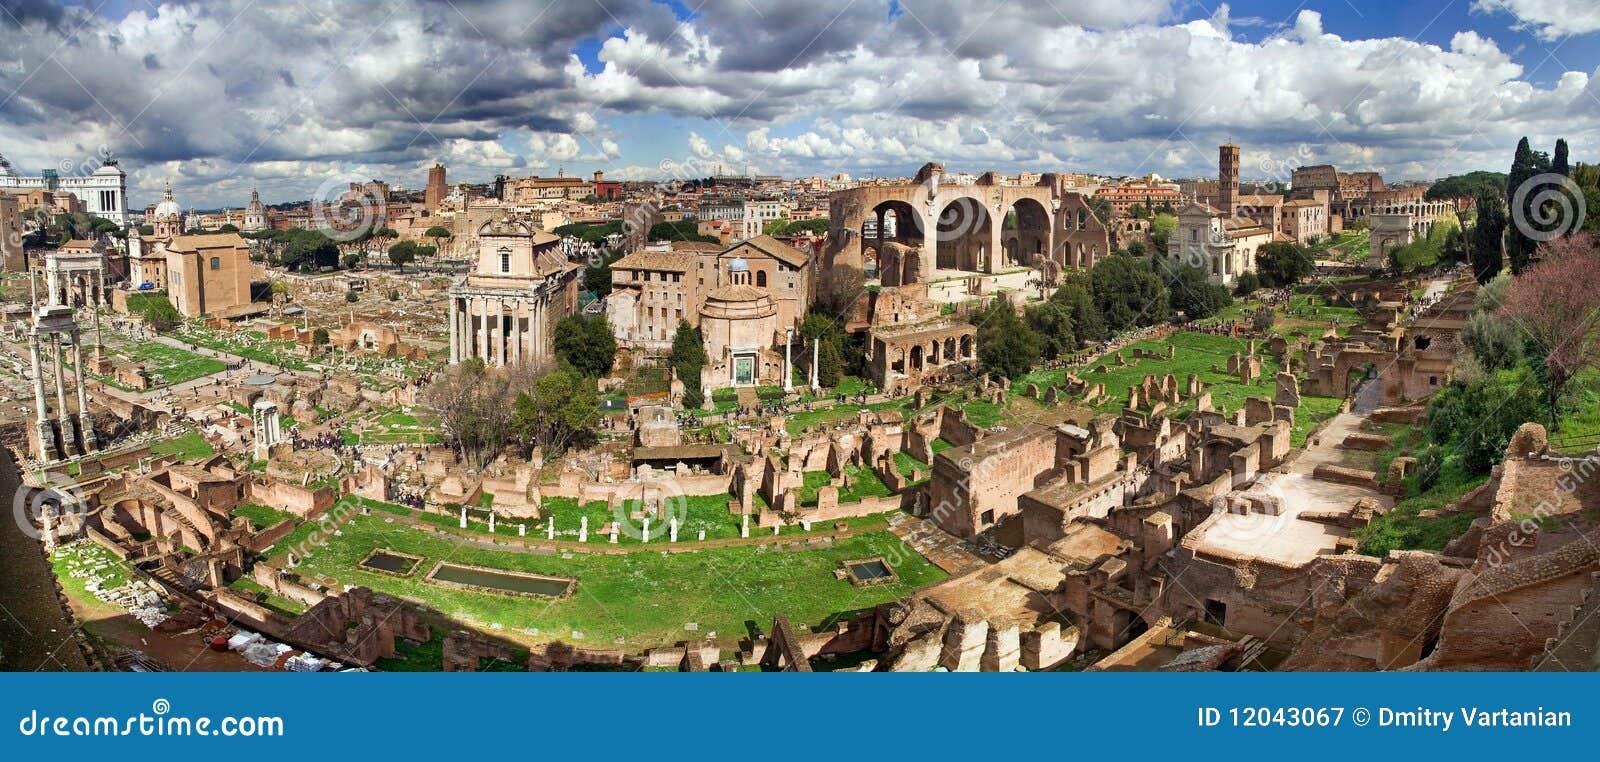 The Roman Forum from Palatine hill, panorama